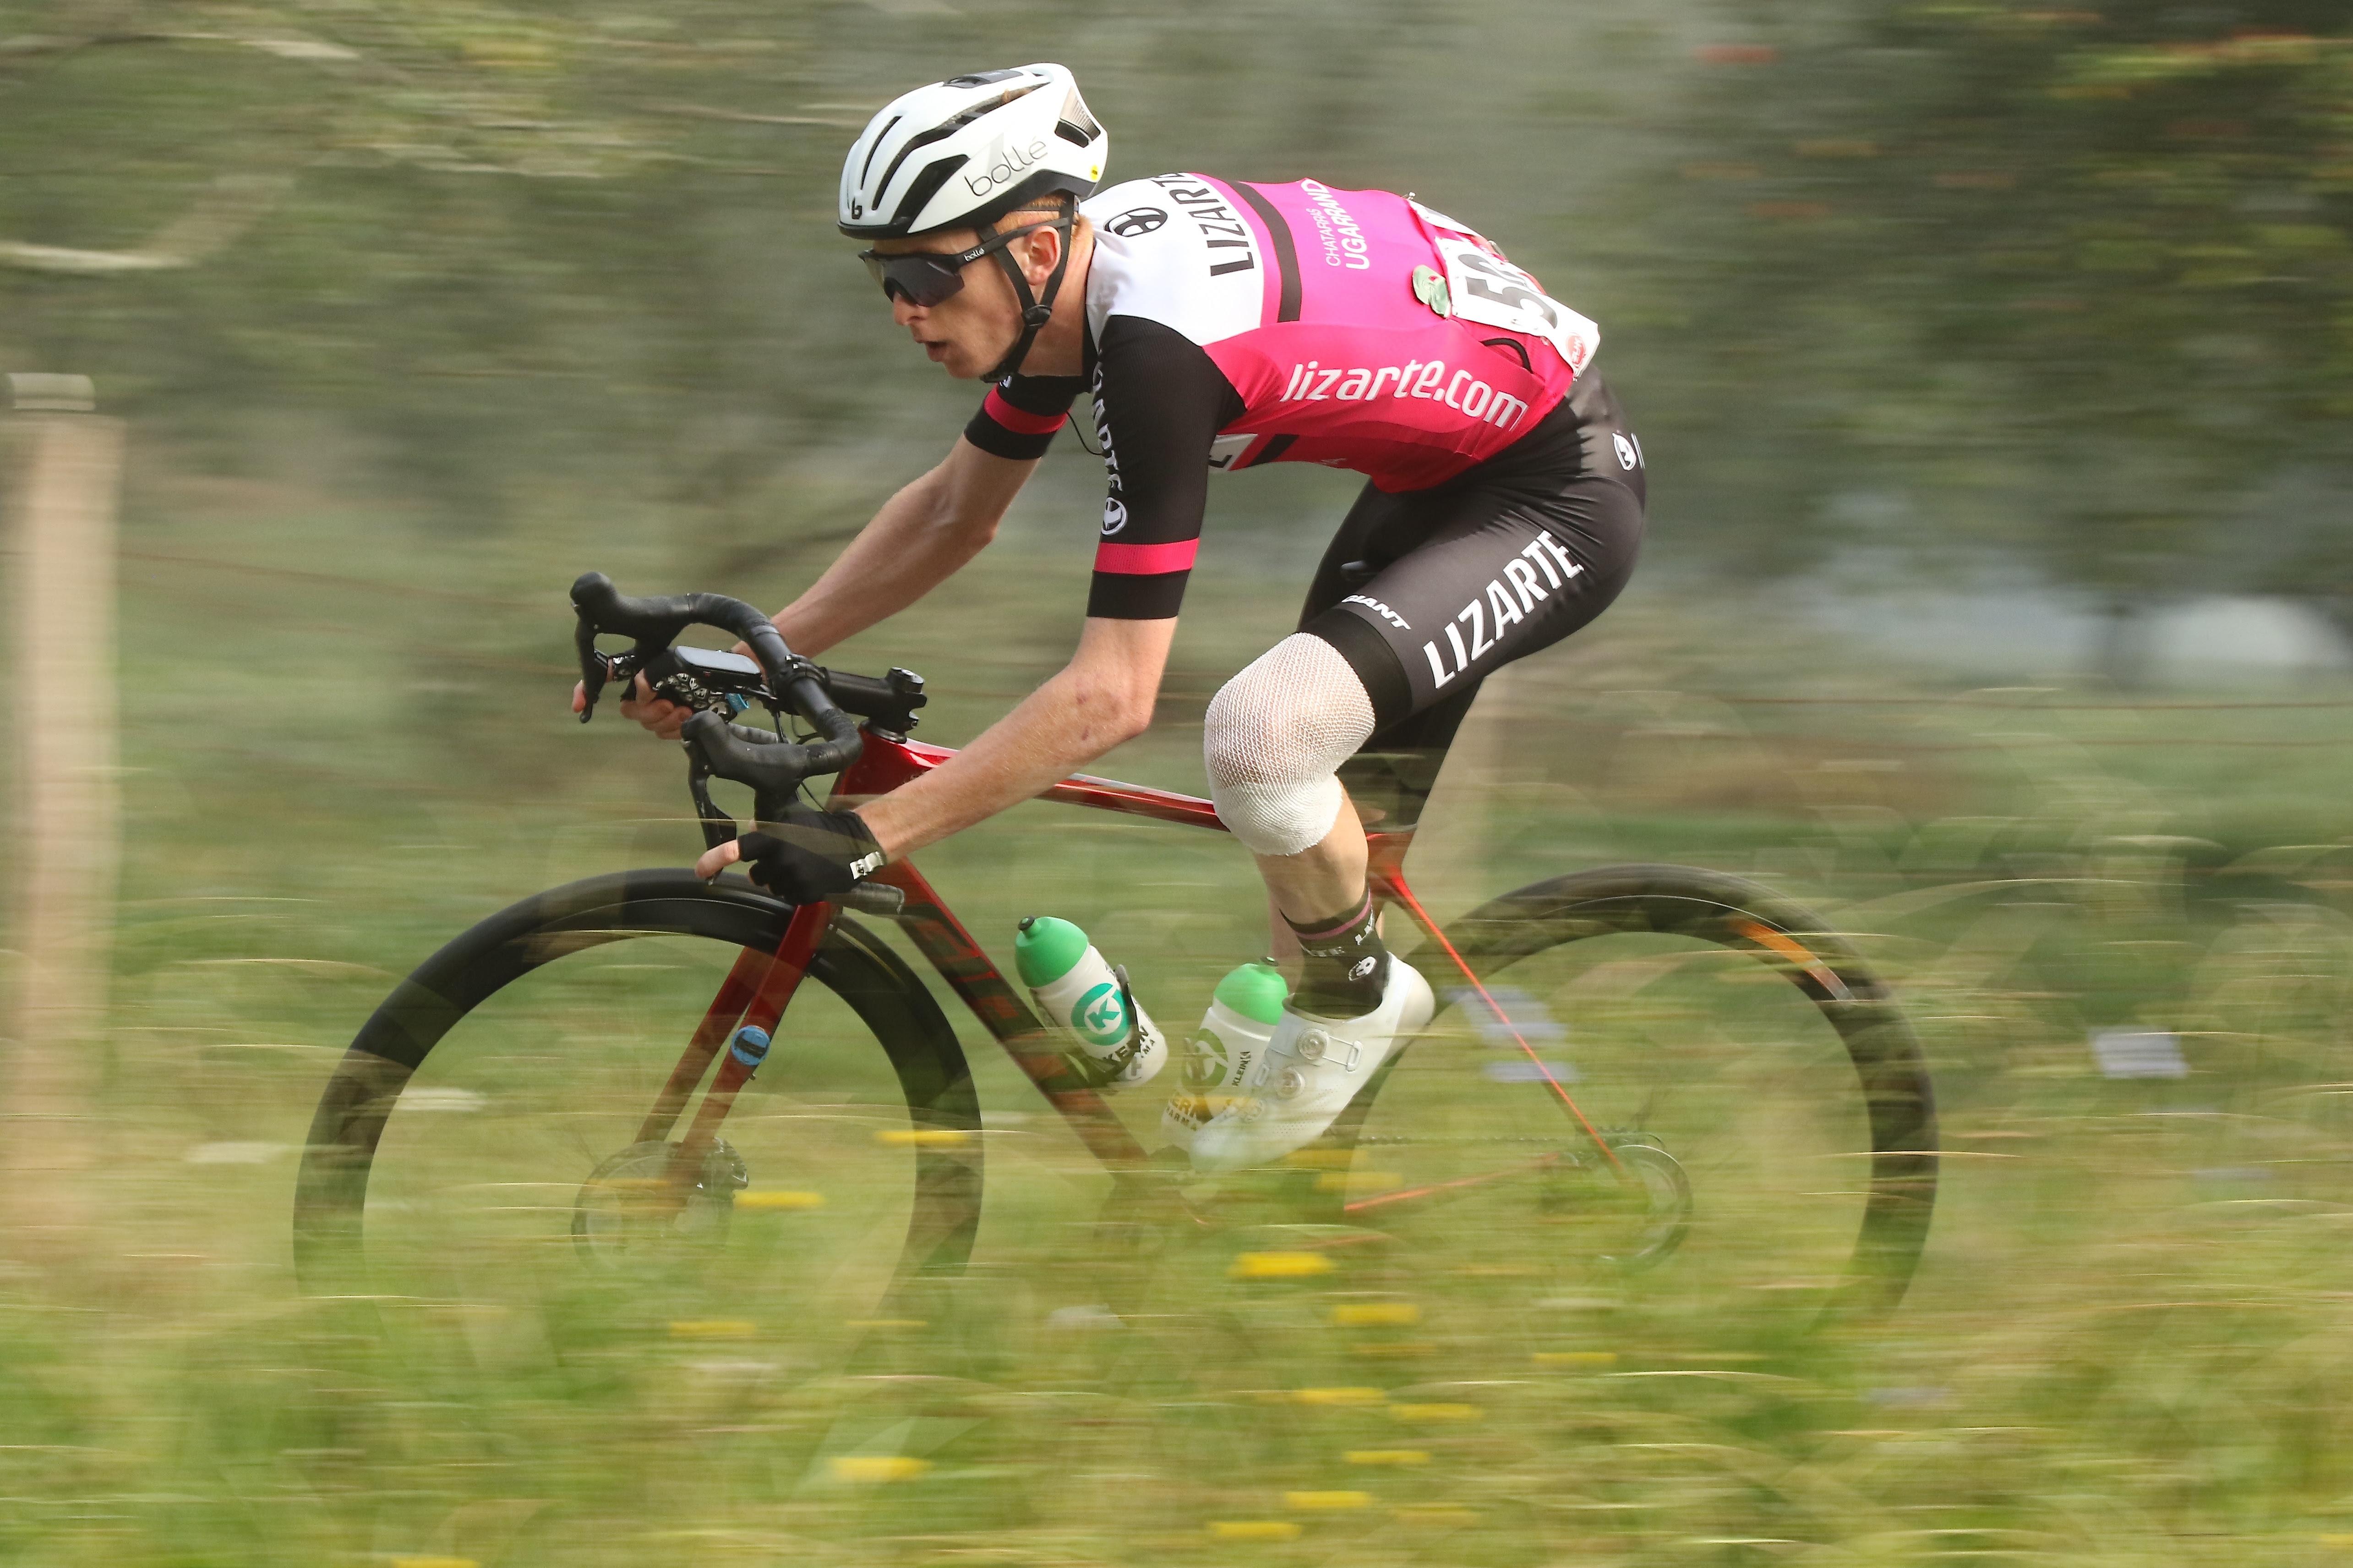 Ferran Robert estará en el equipo de Valverde en 2021 (Oskar Matxin).